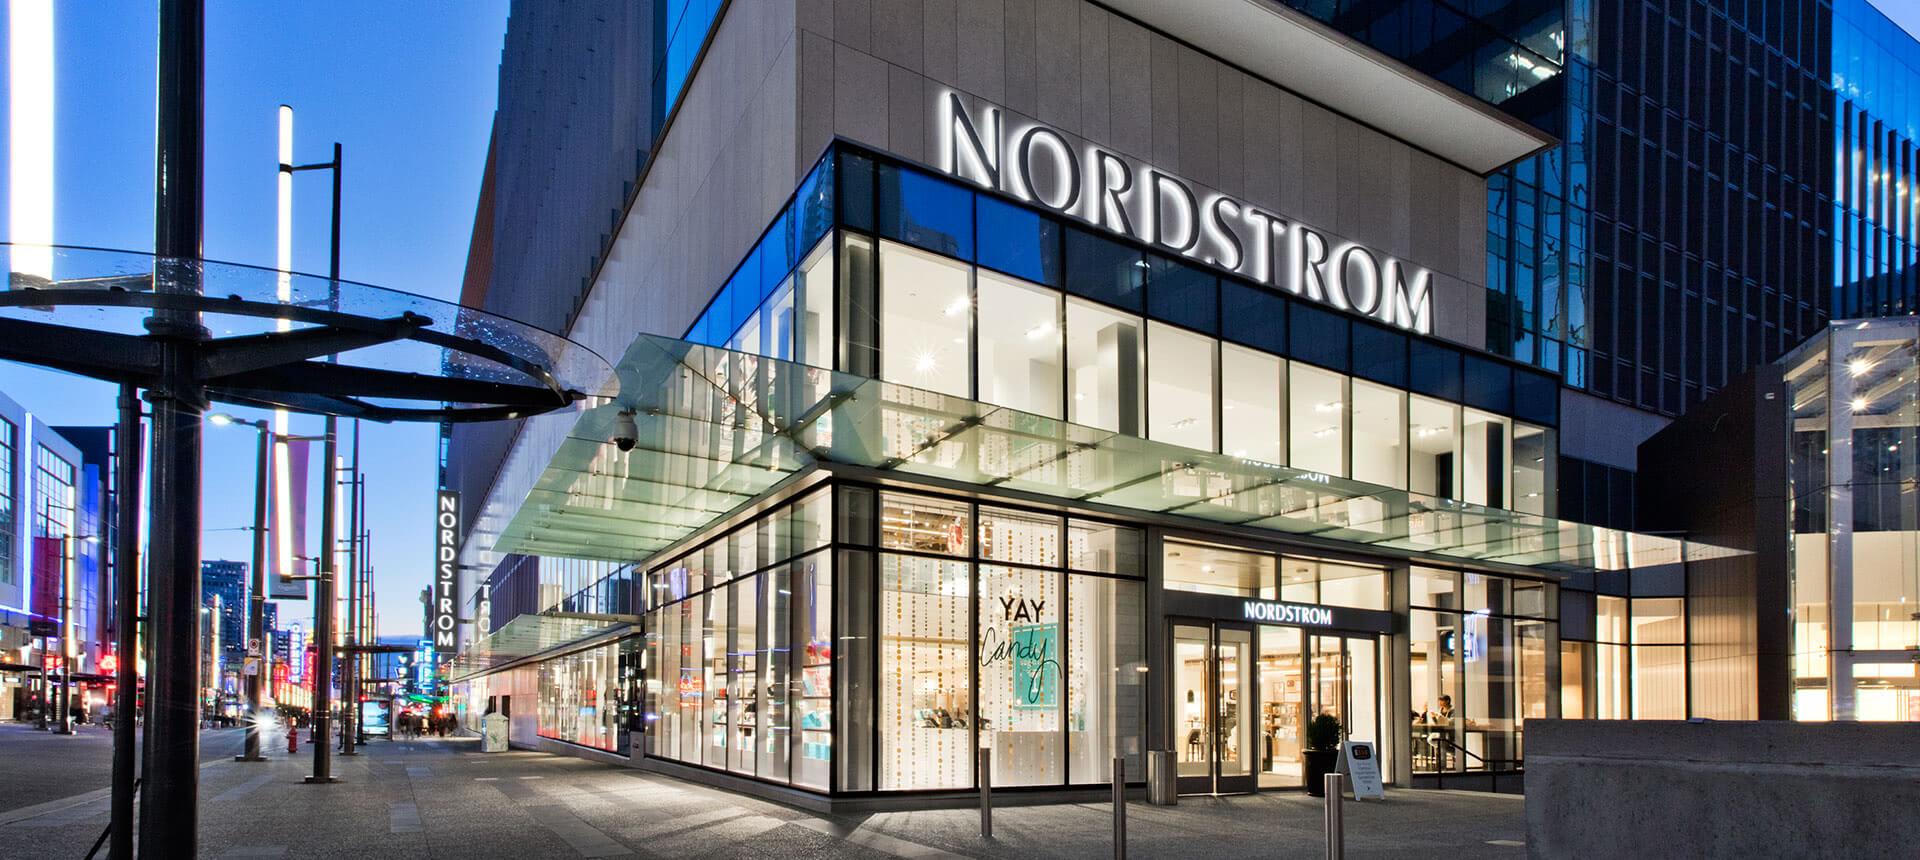 Nordstrom - CallisonRTKL